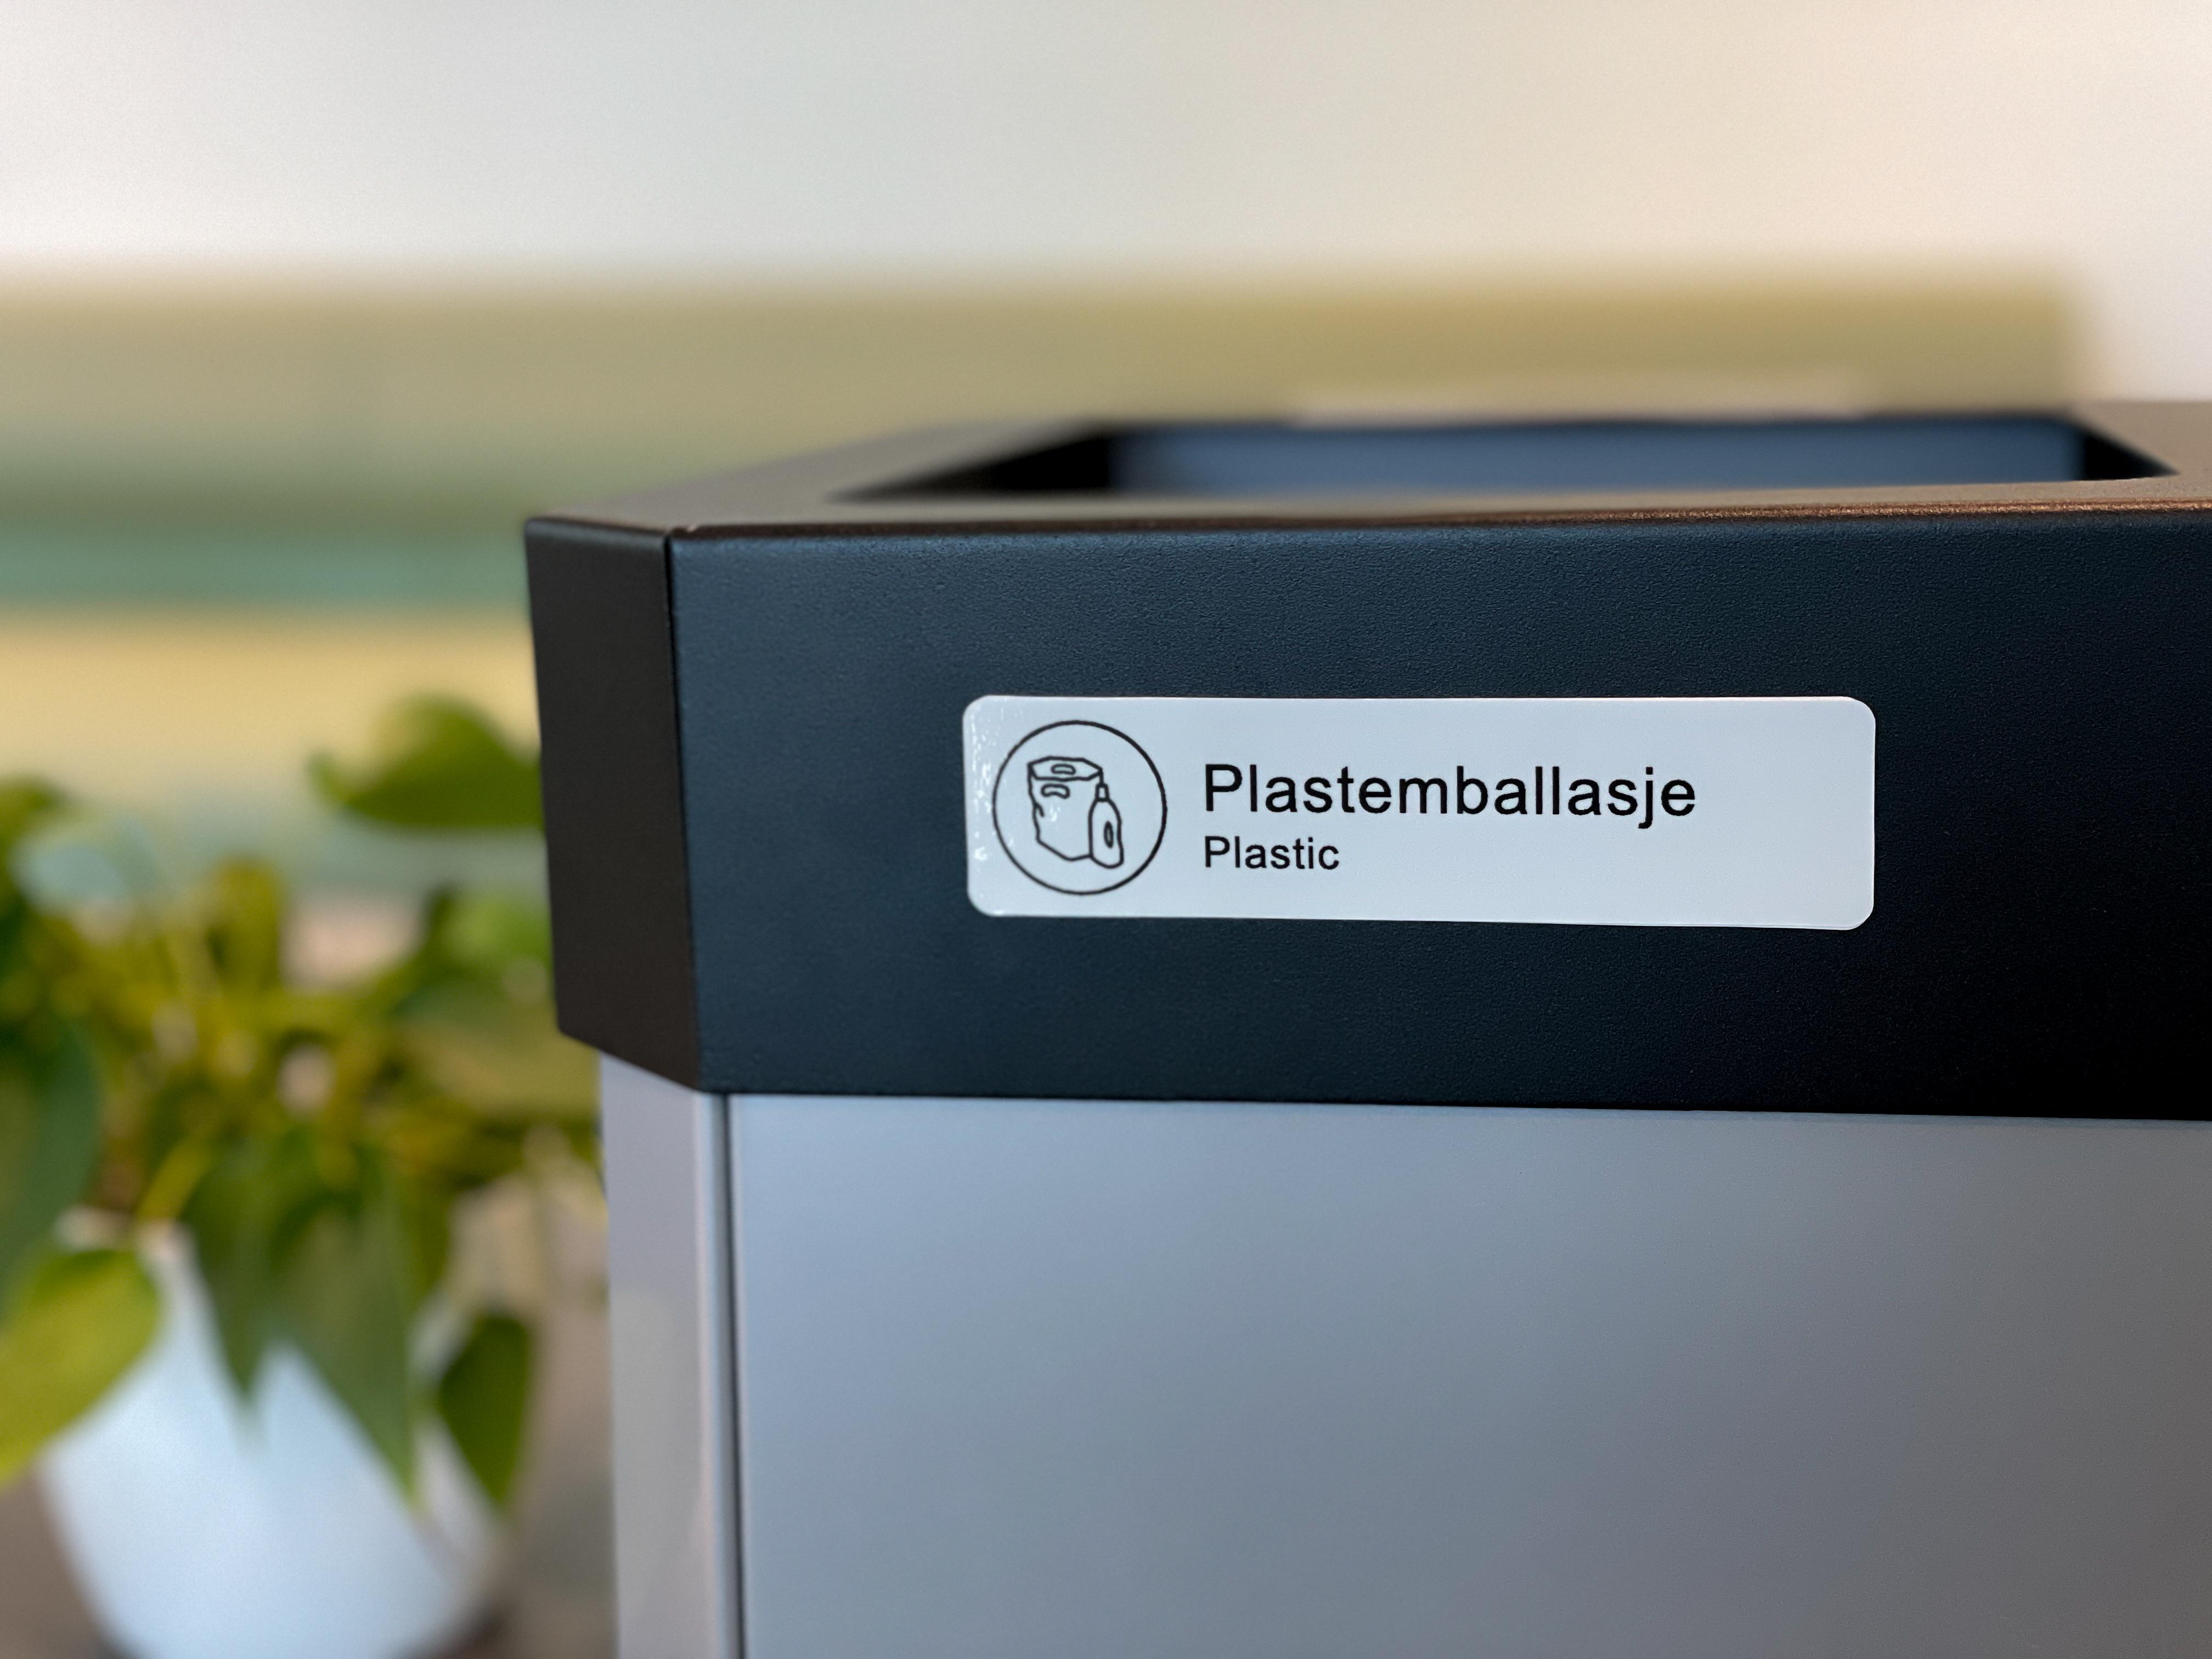 Merkelapp plastemballasje